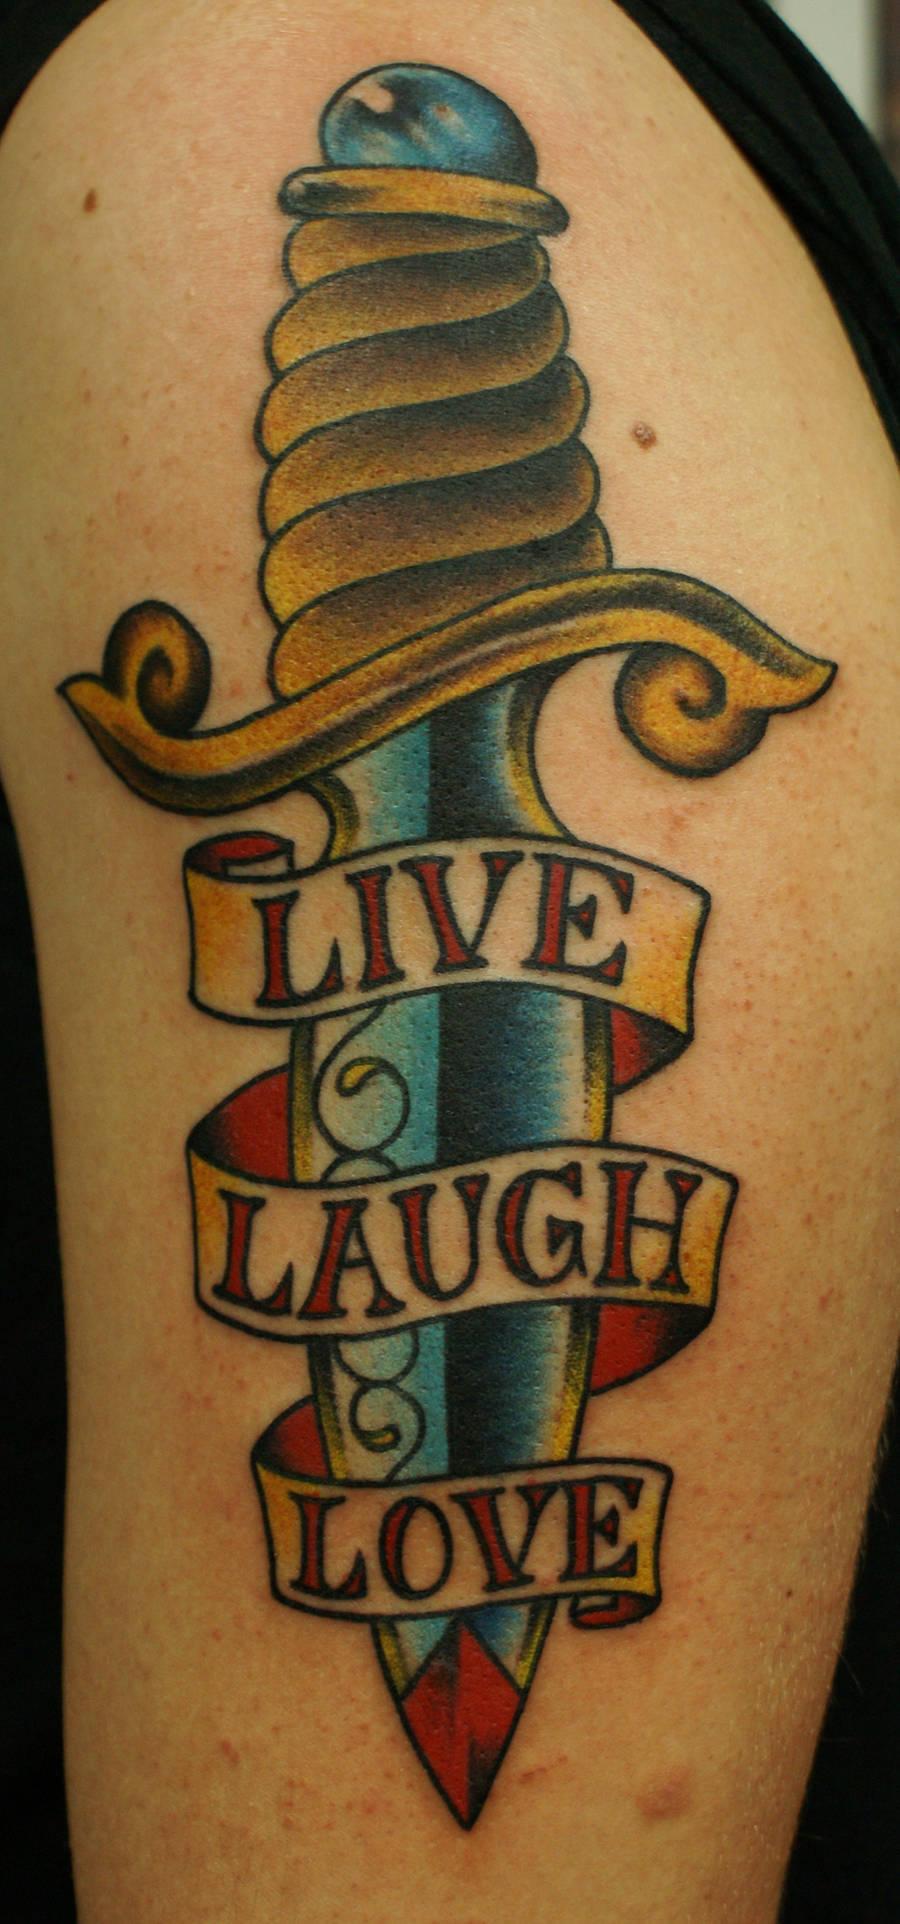 live laugh love dagger by BrettPundt